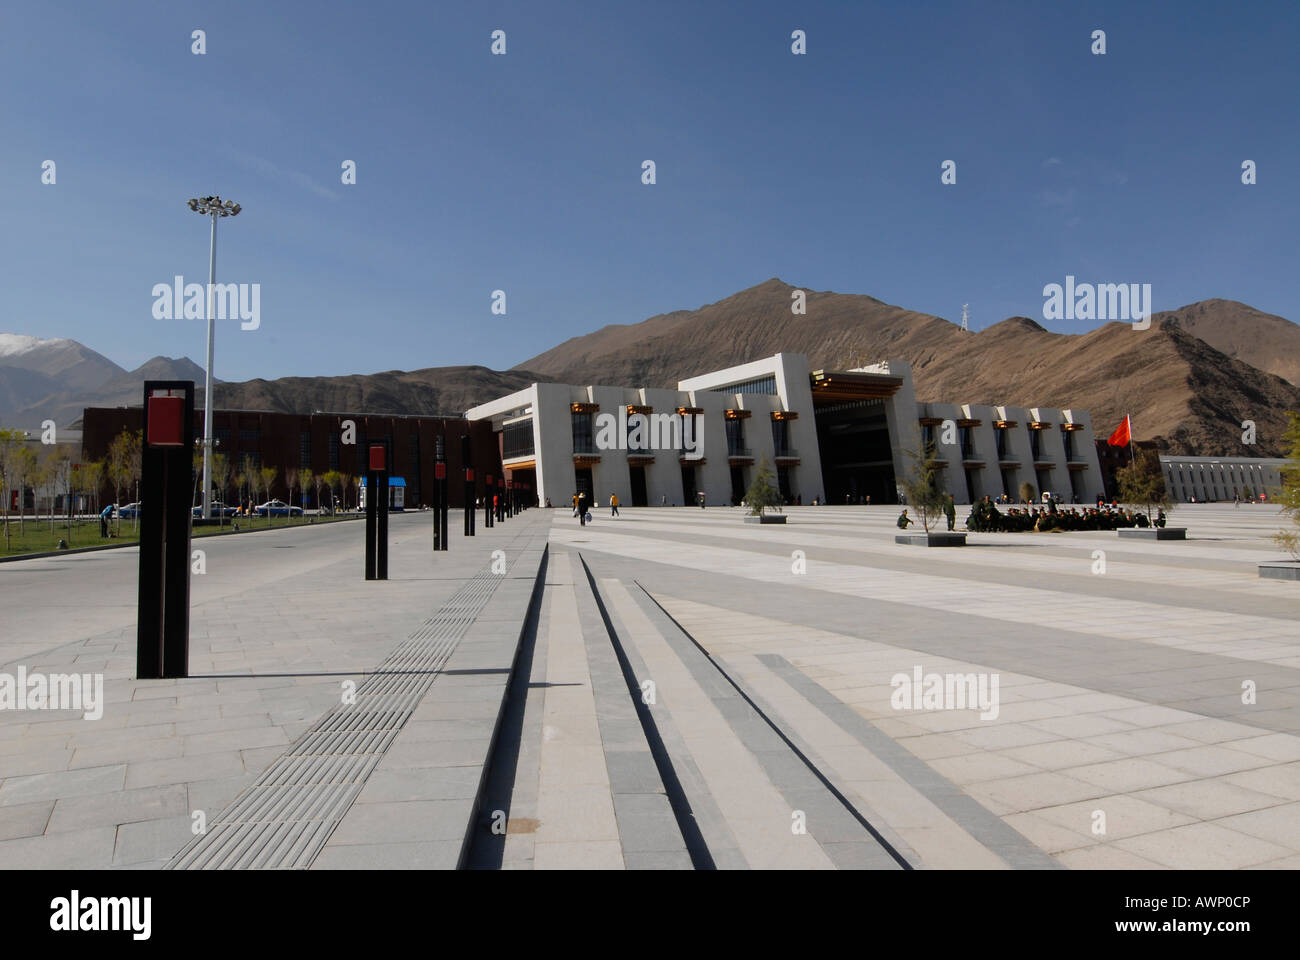 New Qinghai–Tibet railway station in the Tibetan capital of Lhasa, Tibet, China, Asia - Stock Image